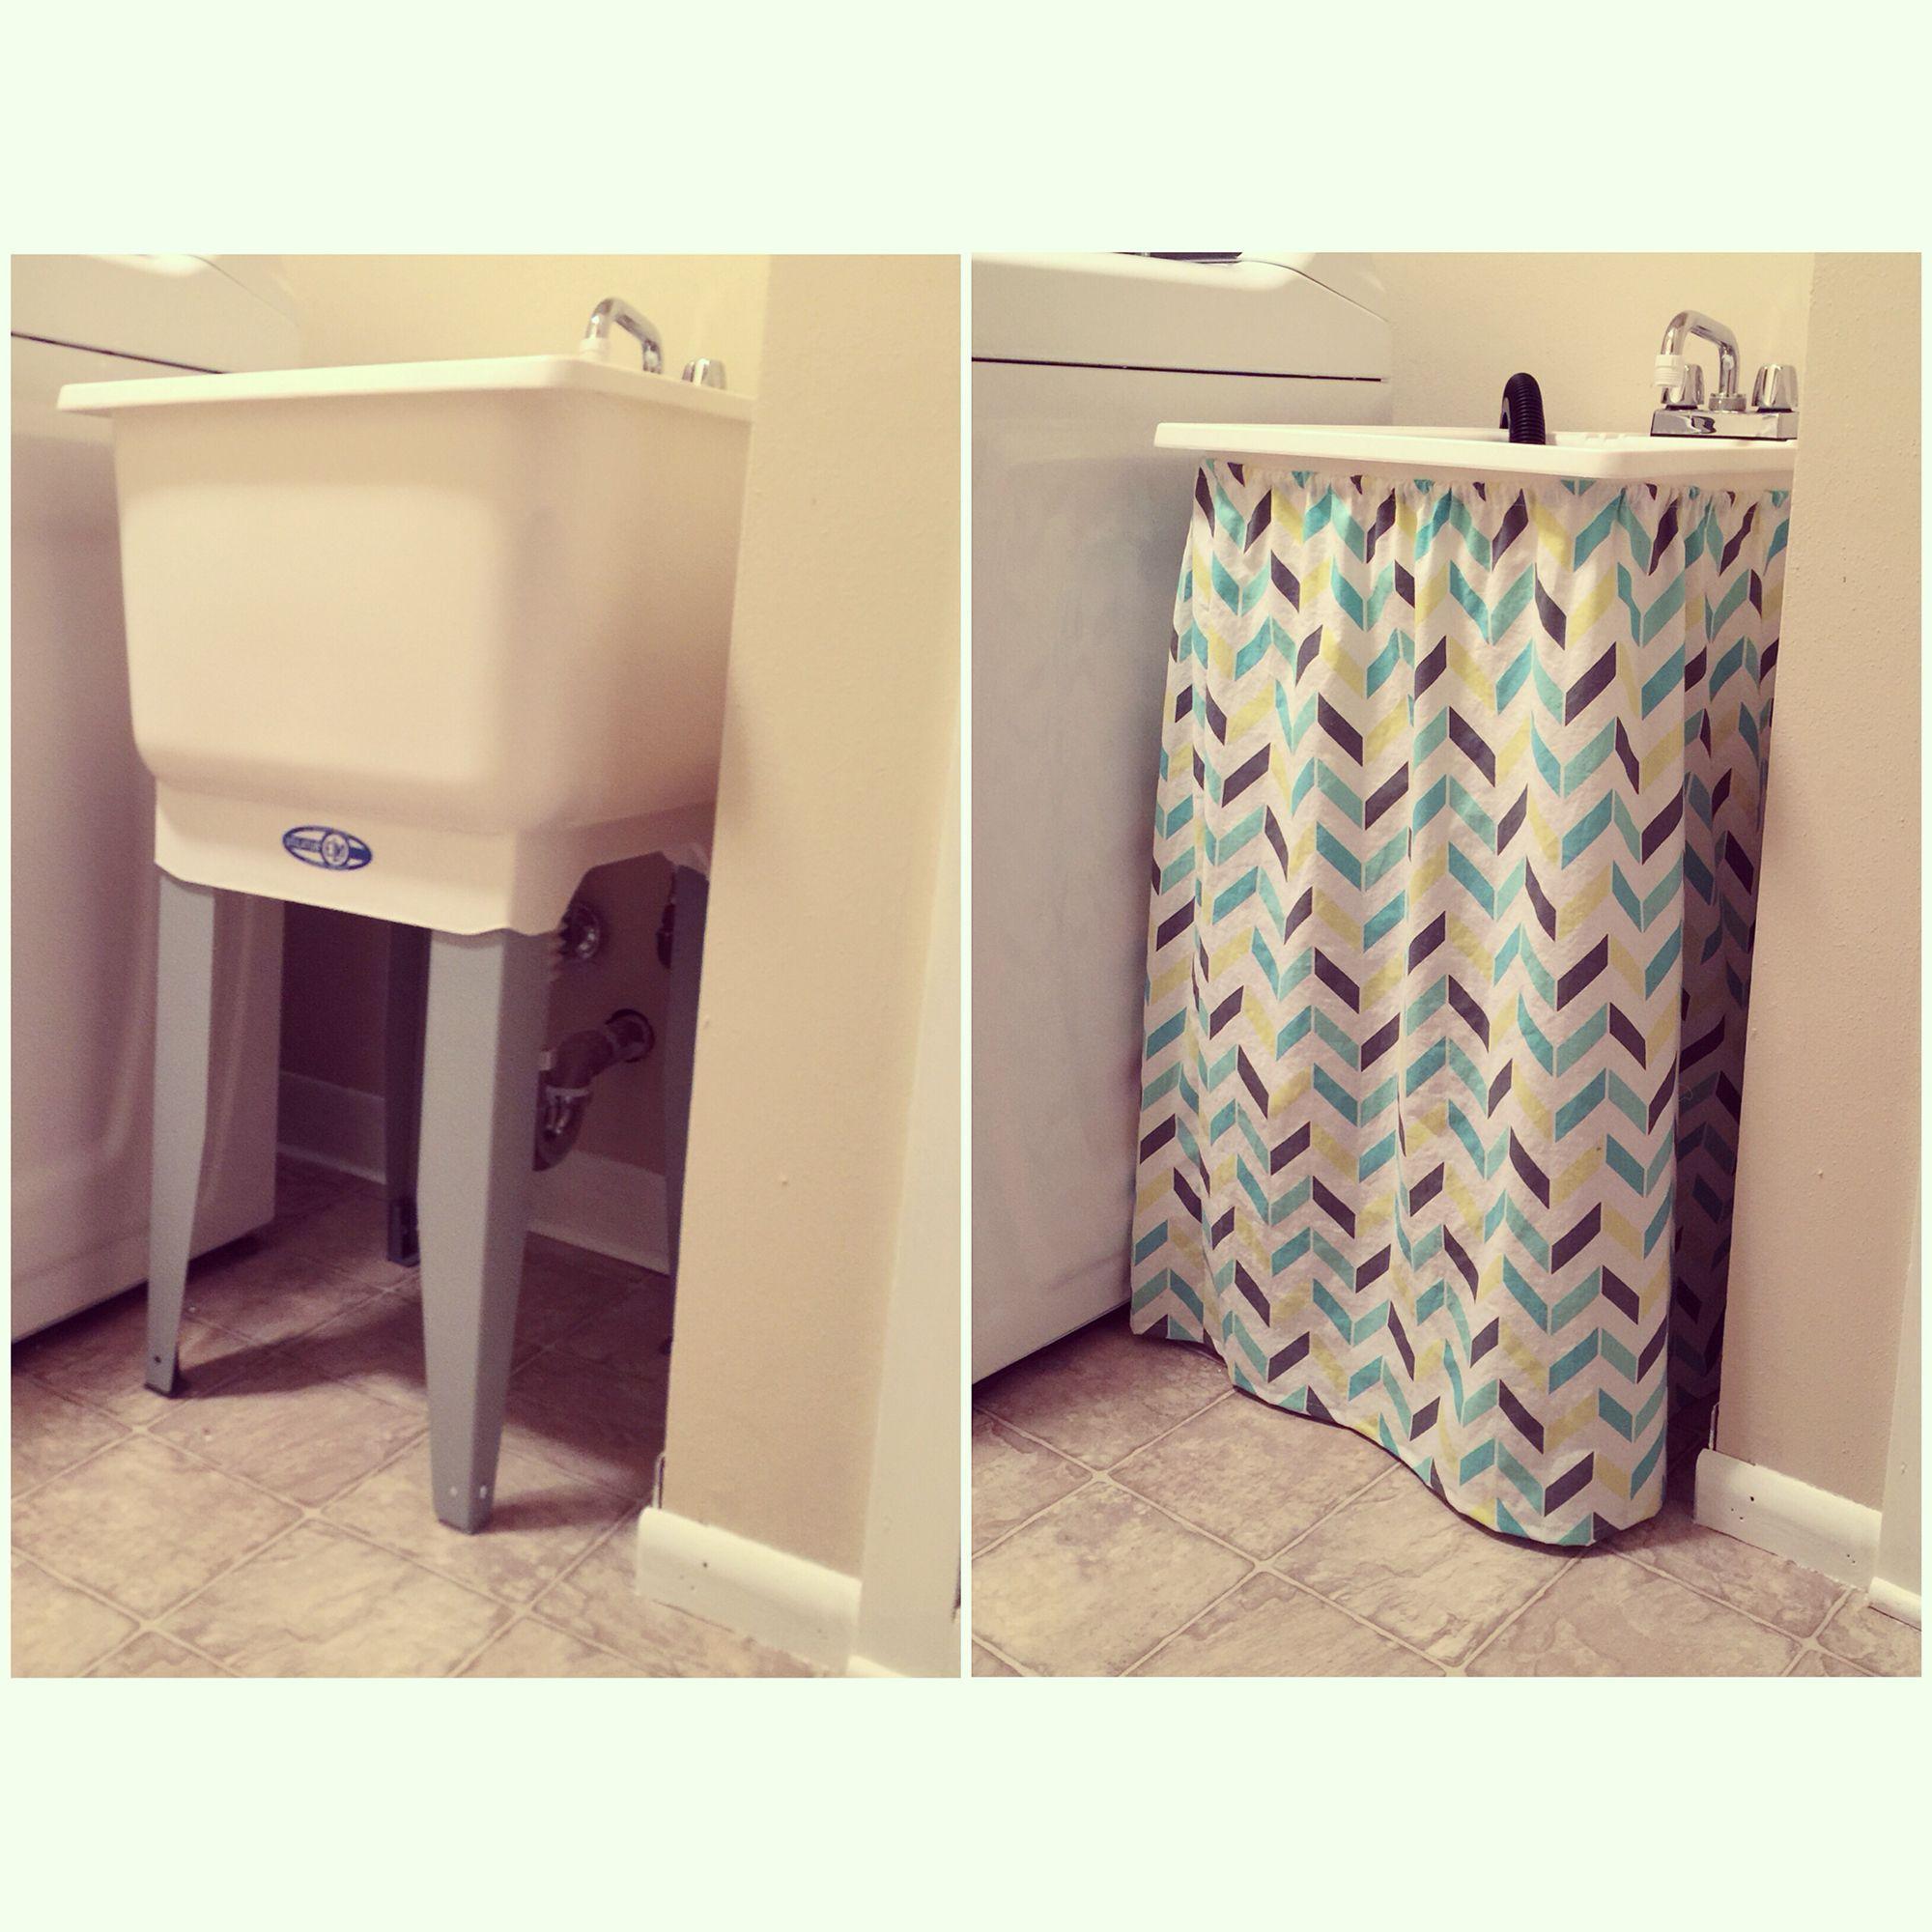 DIY Utility Stationary Tub Skirt Cover Laundry Room Decor